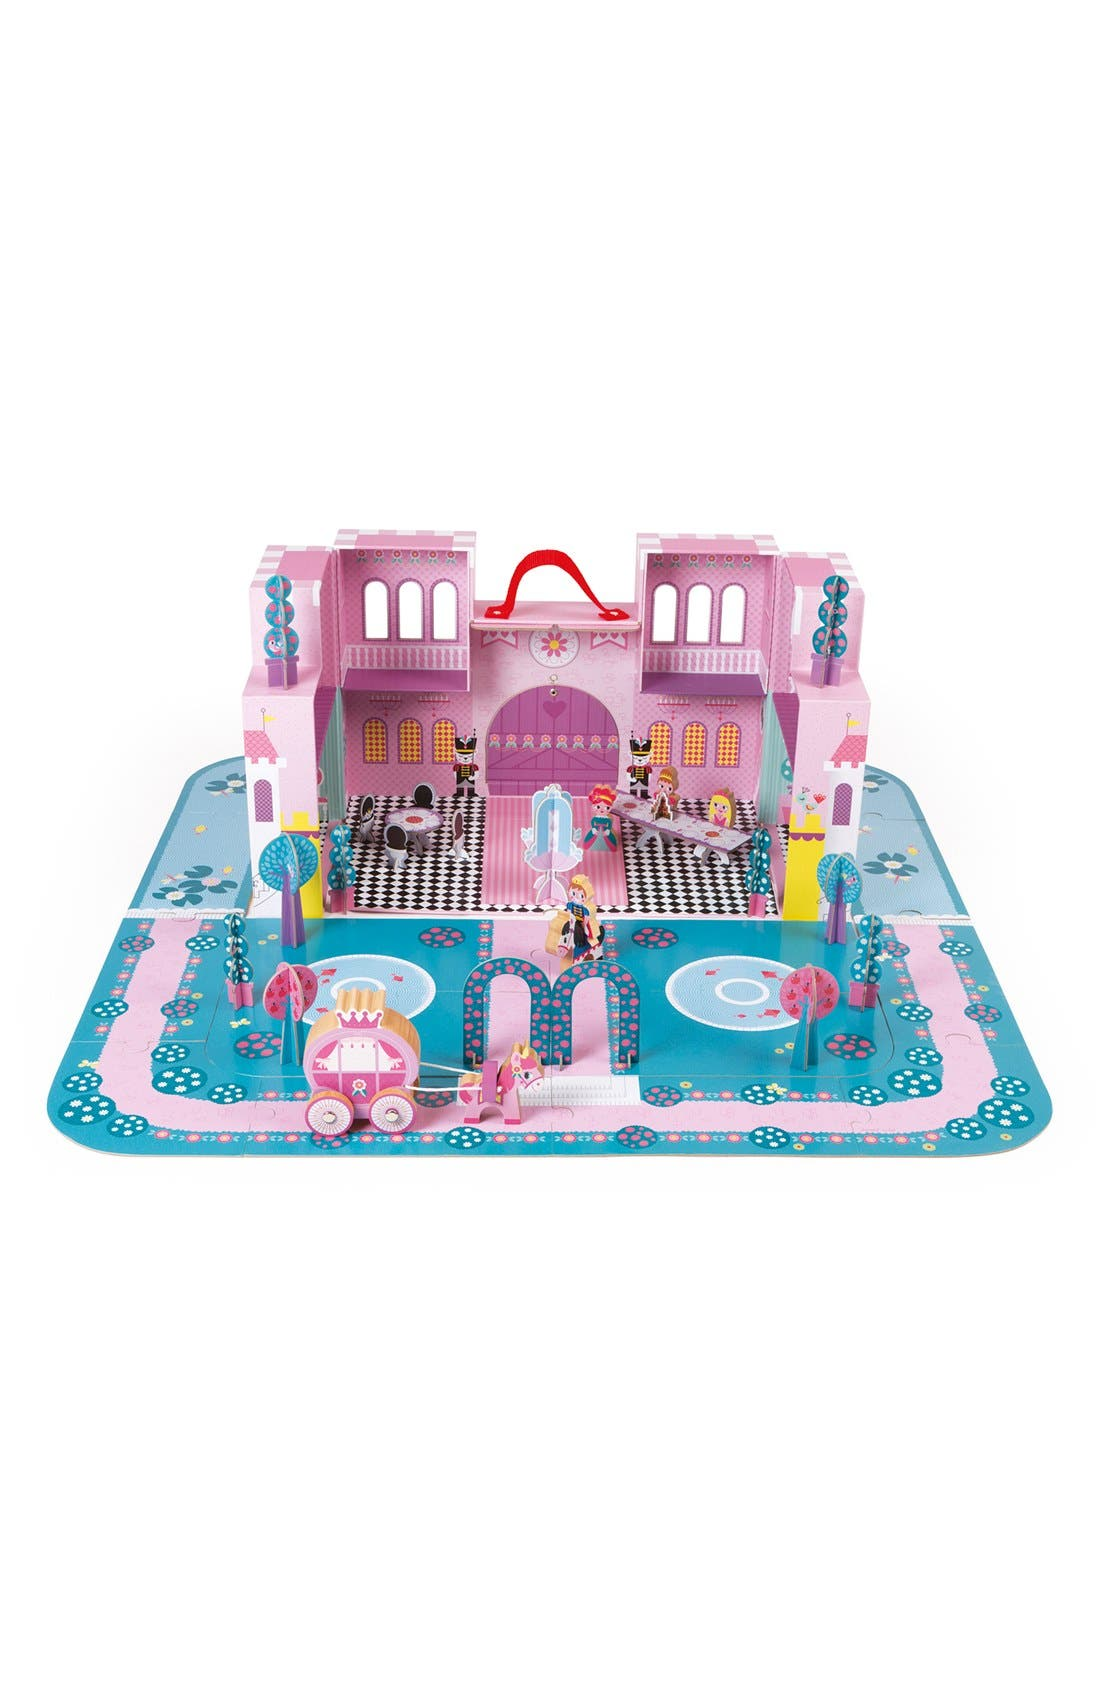 Alternate Image 1 Selected - Janod 'Princess Palace' Play Set